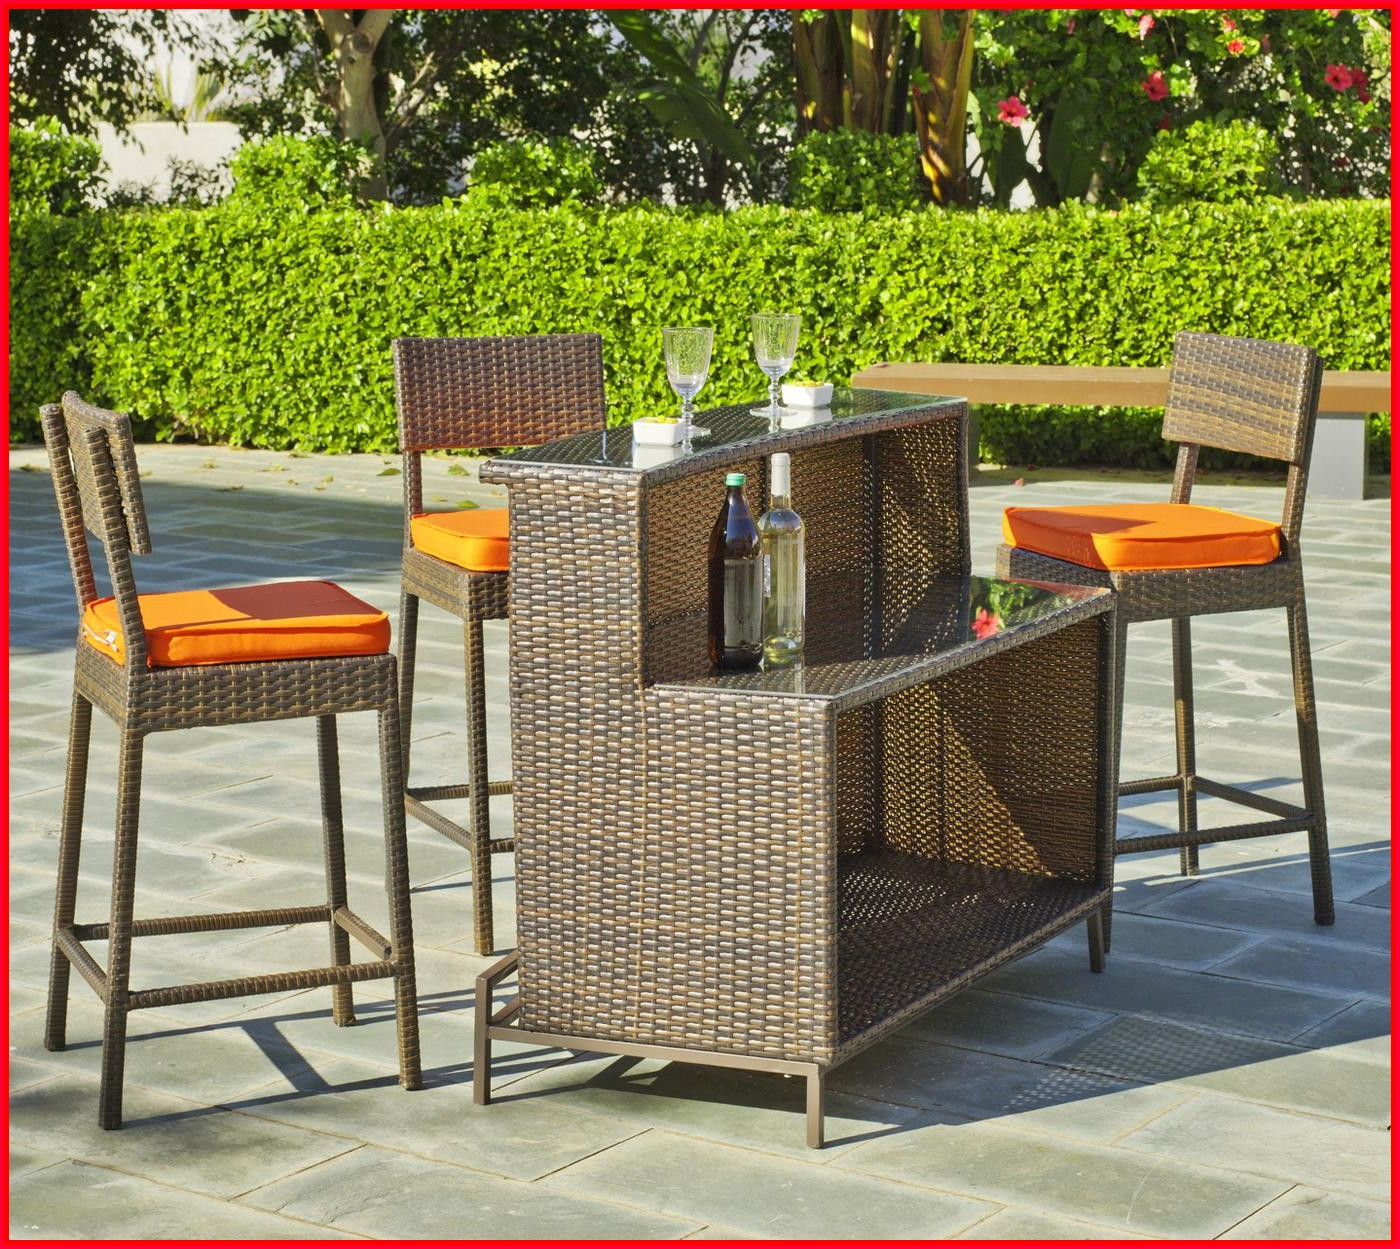 Mesas de bar segunda mano fabulous mesas y sillas de for Sillas de terraza de segunda mano